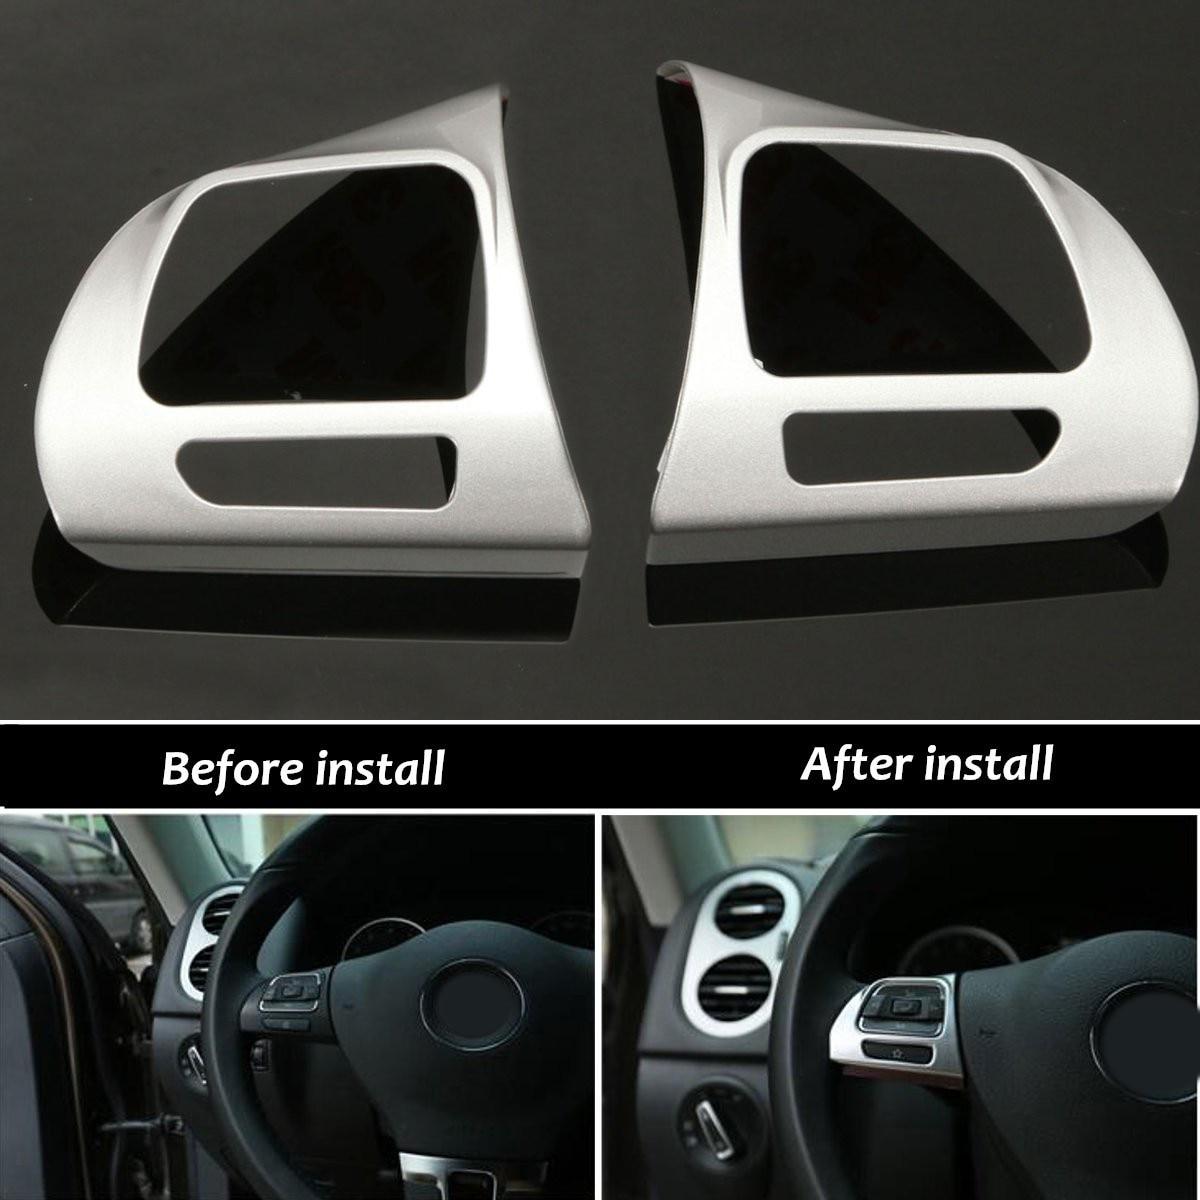 1 par de insignia de la cubierta del ajuste del inserto del cromo del volante para VW Golf MK6 Jetta Passat B7 CC